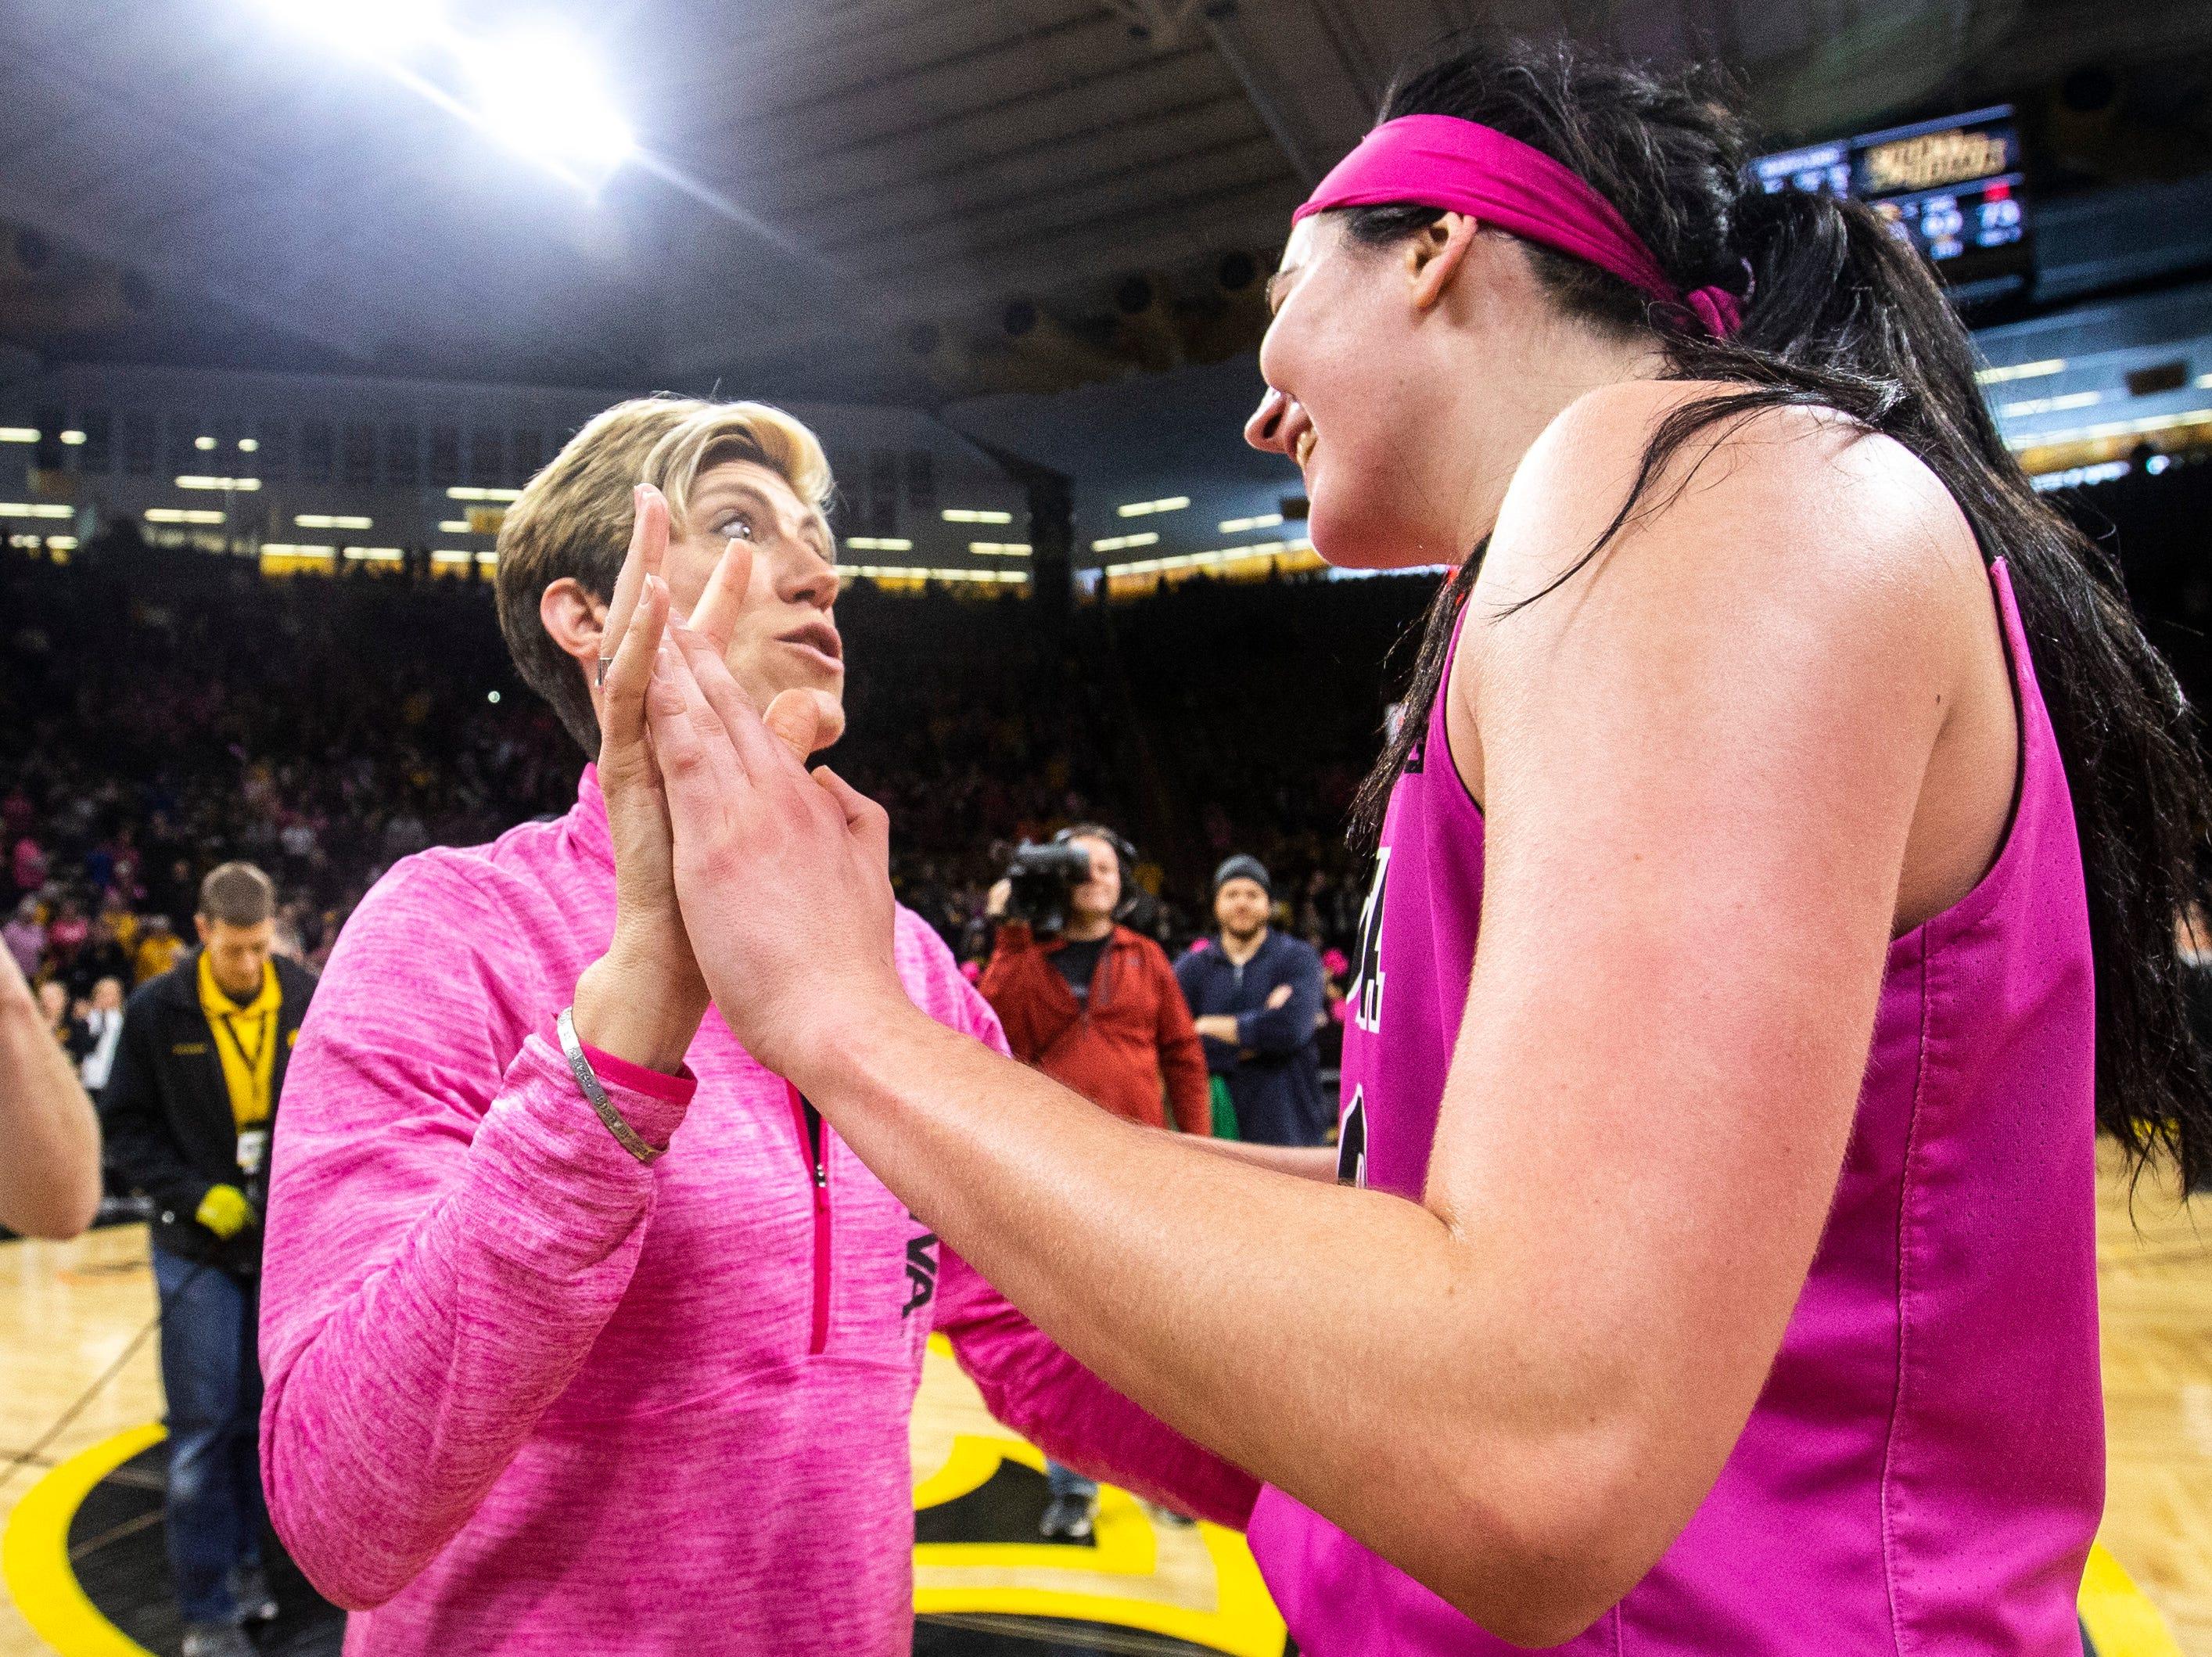 Iowa associate head coach Jan Jensen talks with Iowa center Megan Gustafson (10) after a NCAA Big Ten Conference women's basketball game on Sunday, Feb. 17, 2019 at Carver-Hawkeye Arena in Iowa City, Iowa.